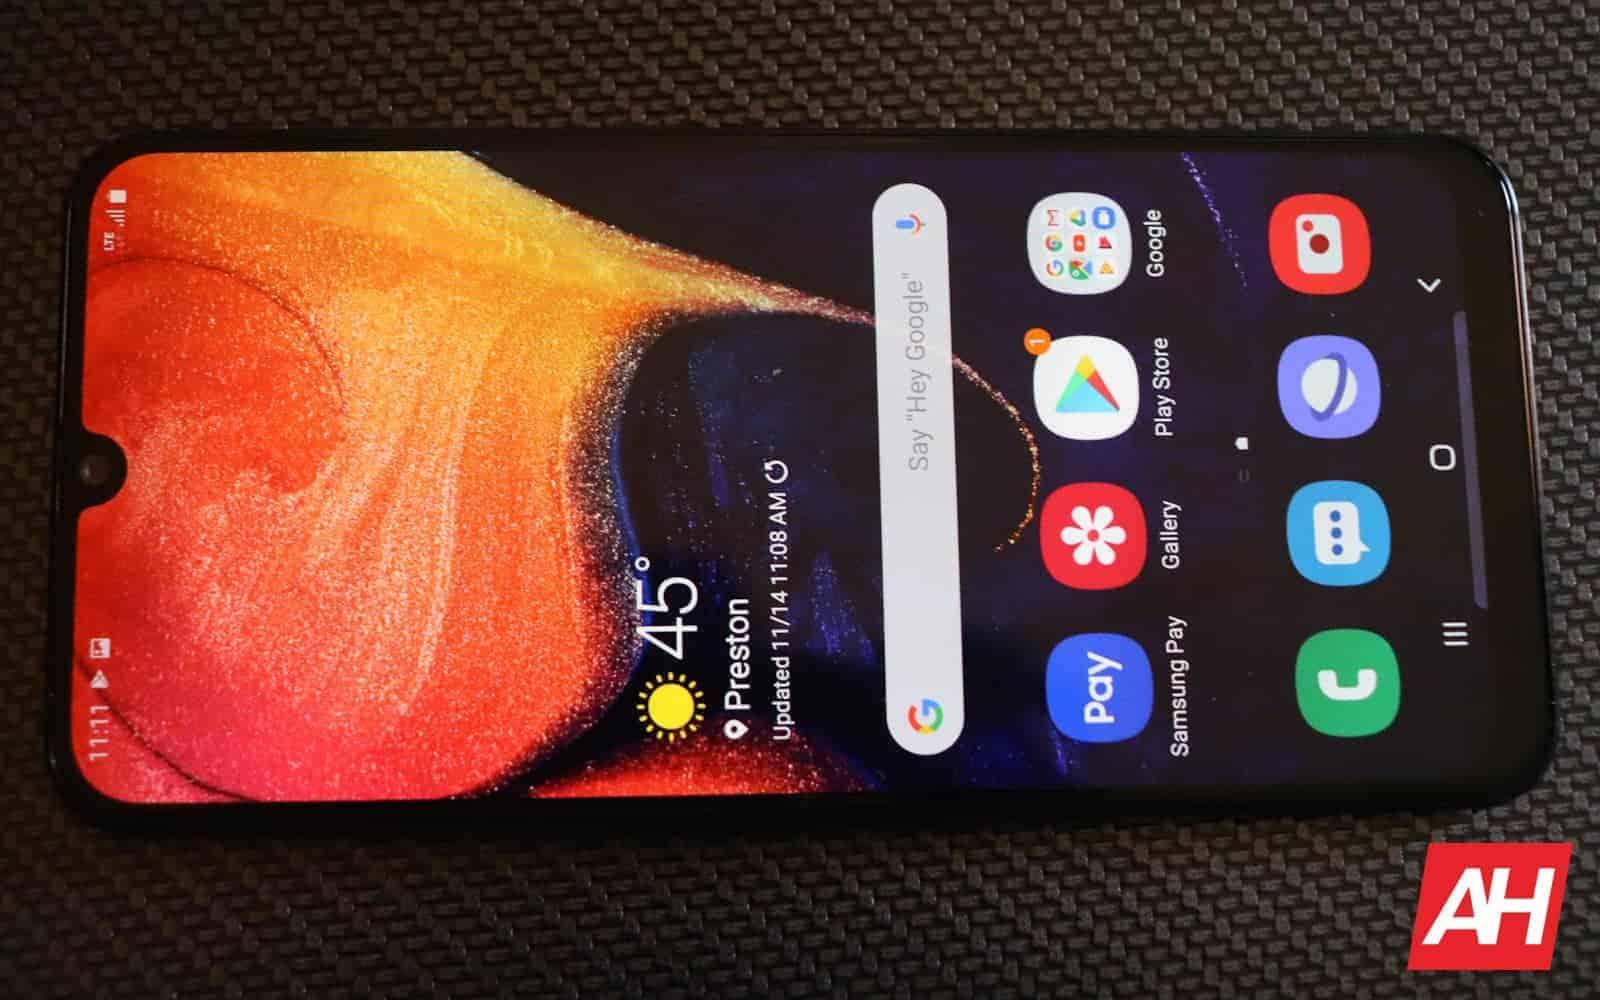 Samsung Galaxy A50 Review 03 display AH 2019